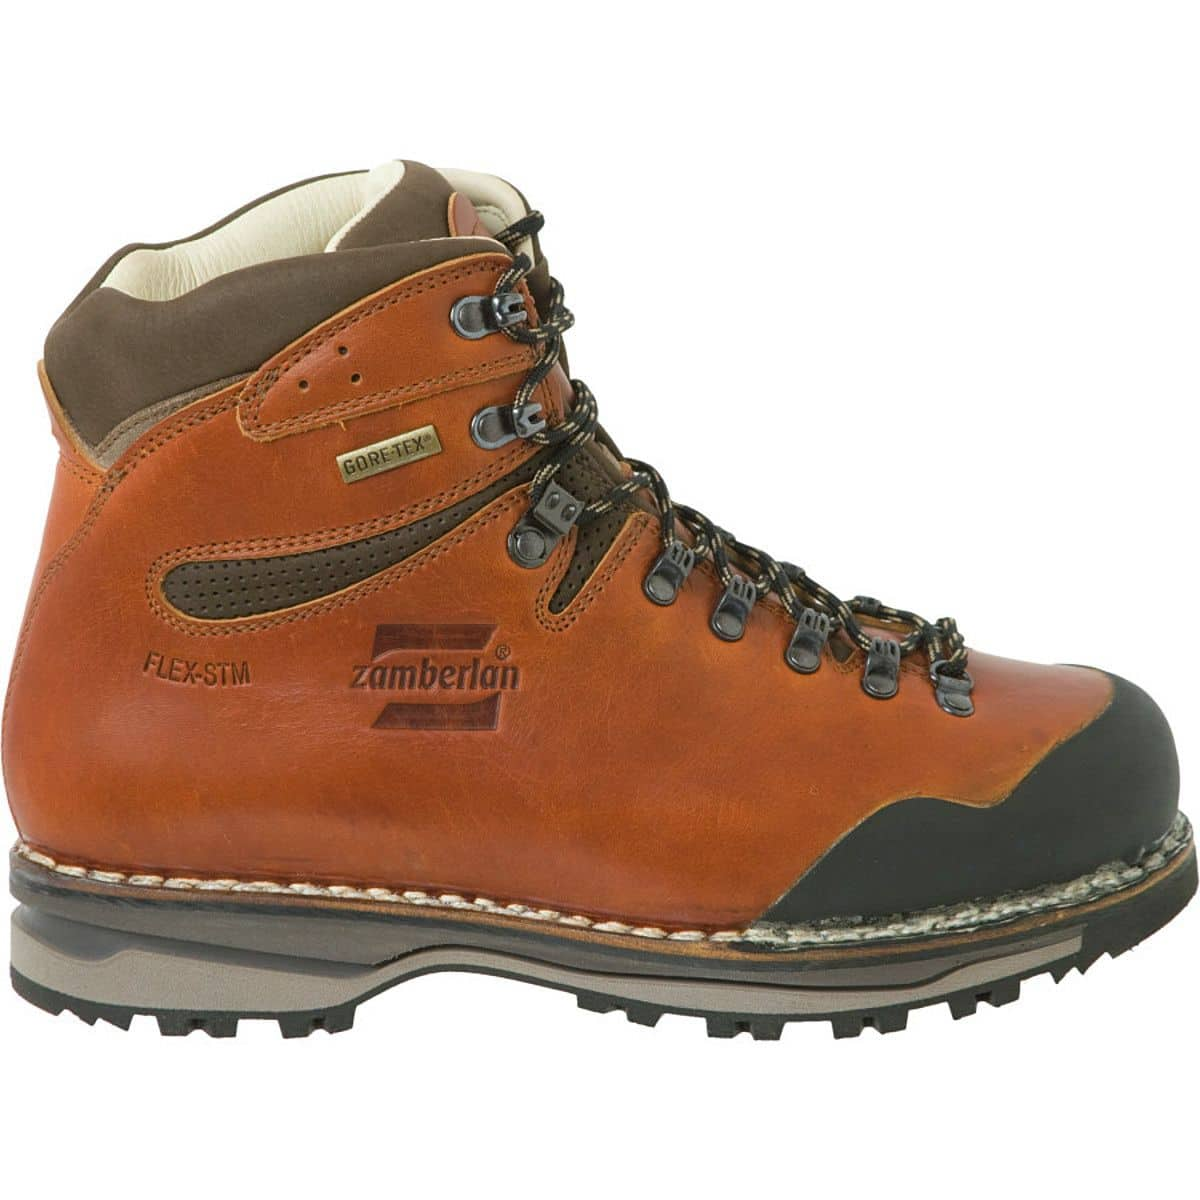 Hiking Boots Zamberlan M 1025 TOFANE NW GTX RR $320.50 shipped @exxpozed.com